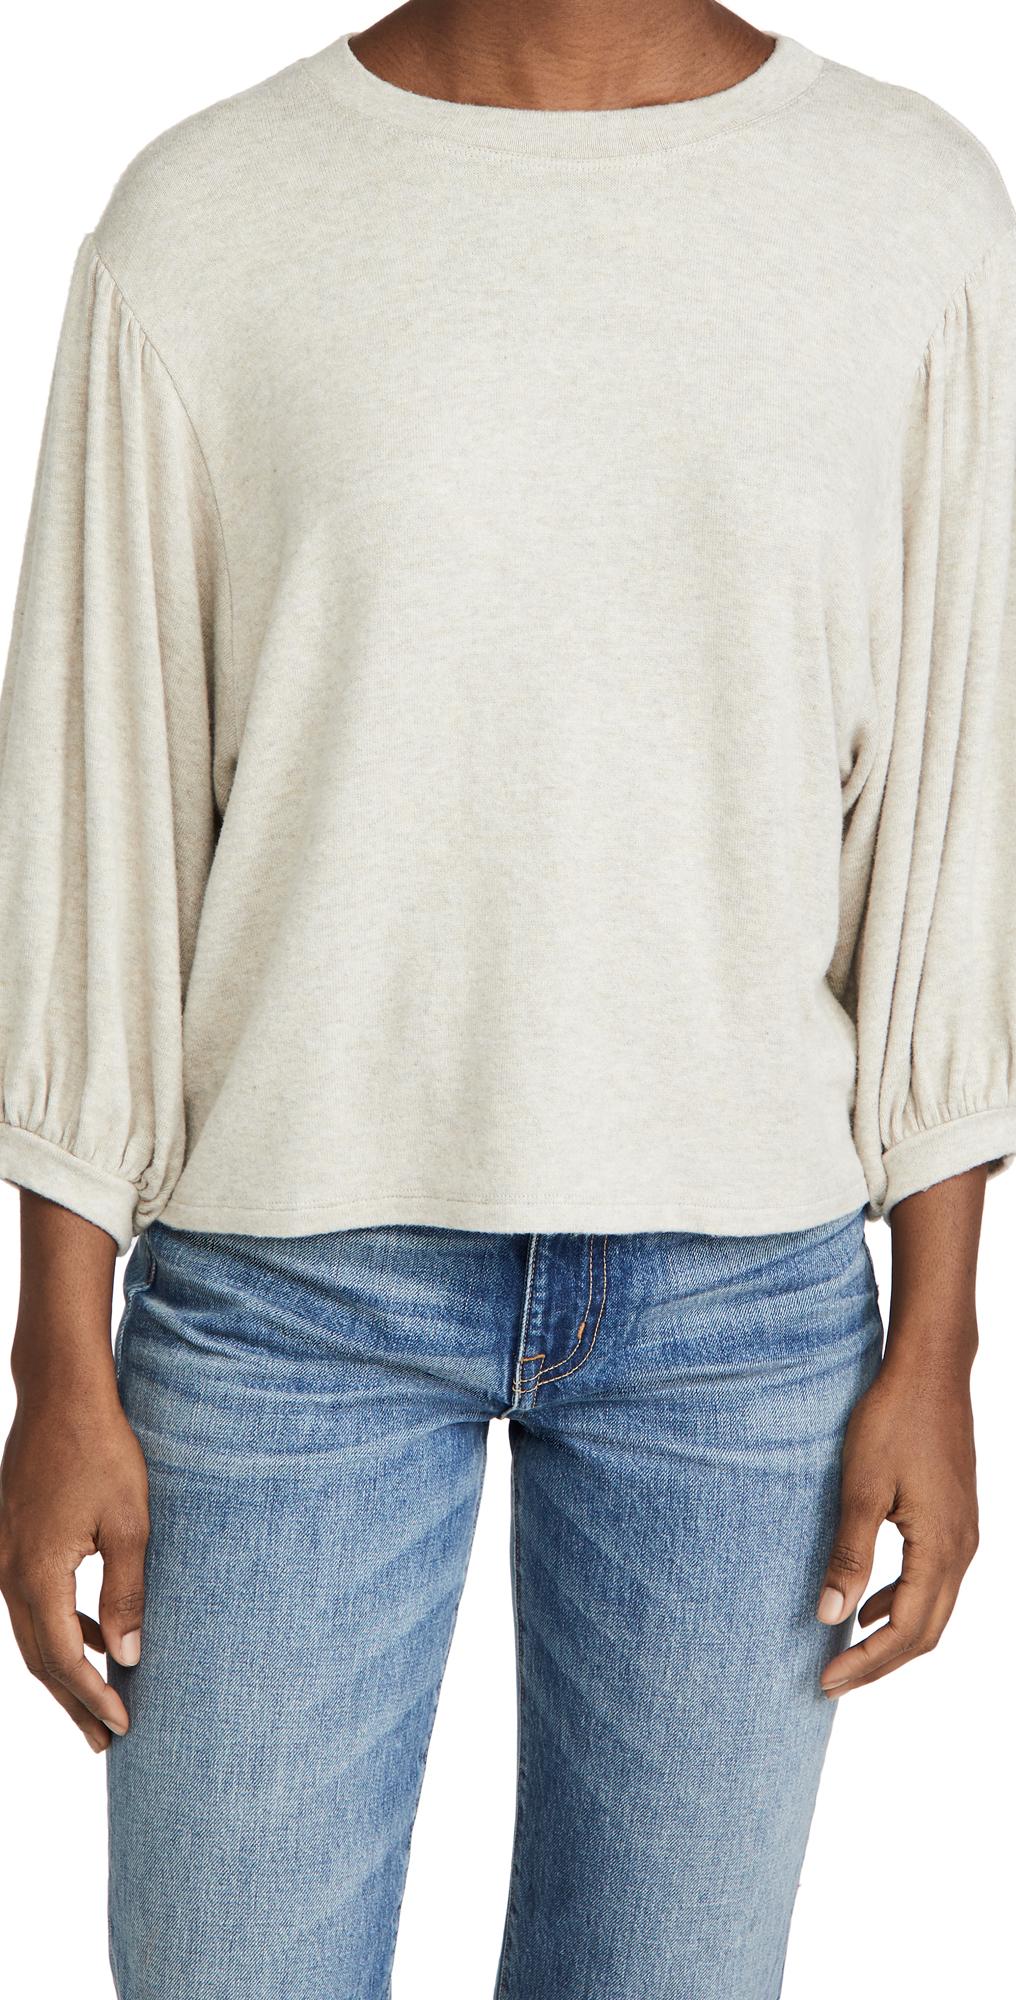 Velvet 3/4 Sleeve Sweatshirt